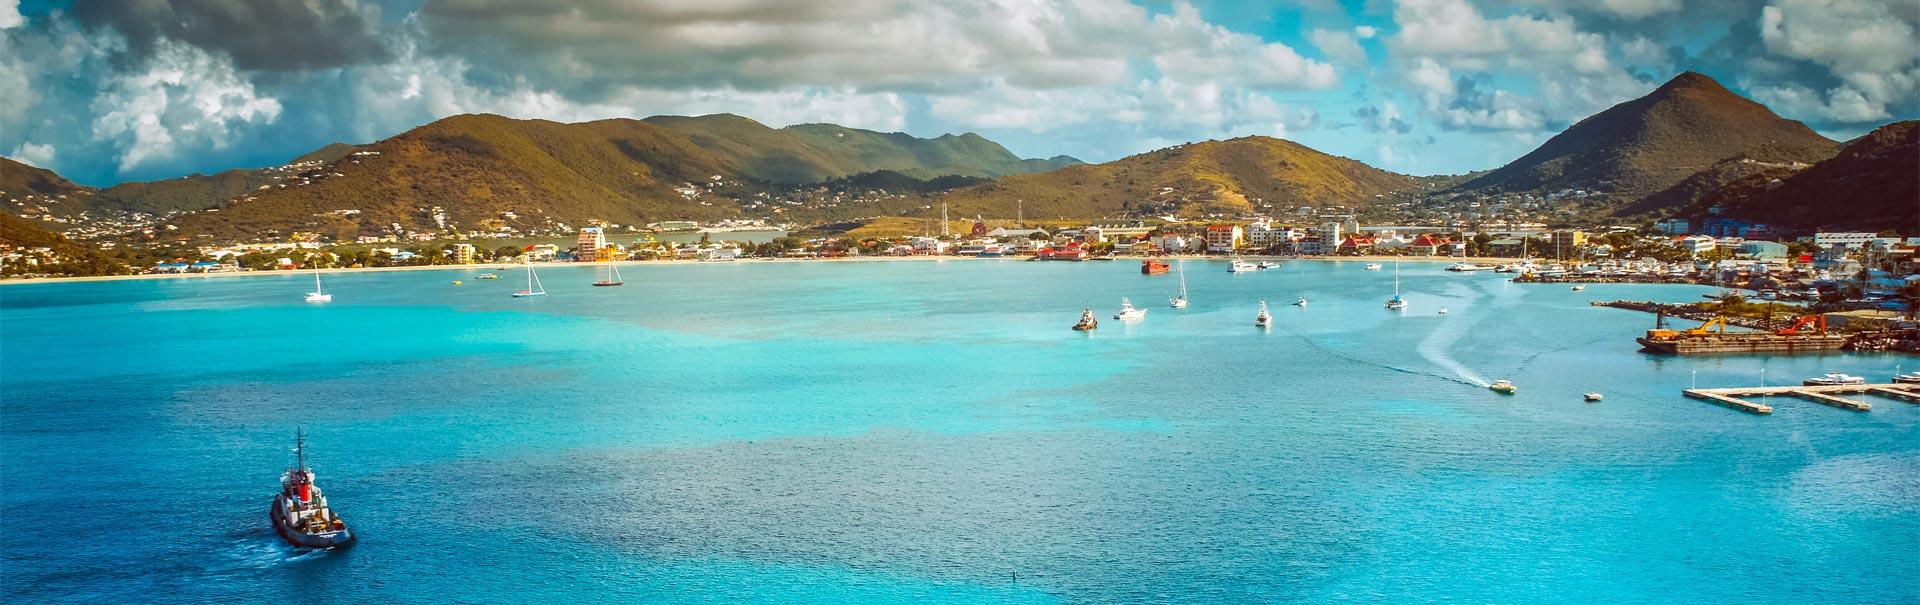 American Dream with Bahamas Cruise (AMDM) Banner